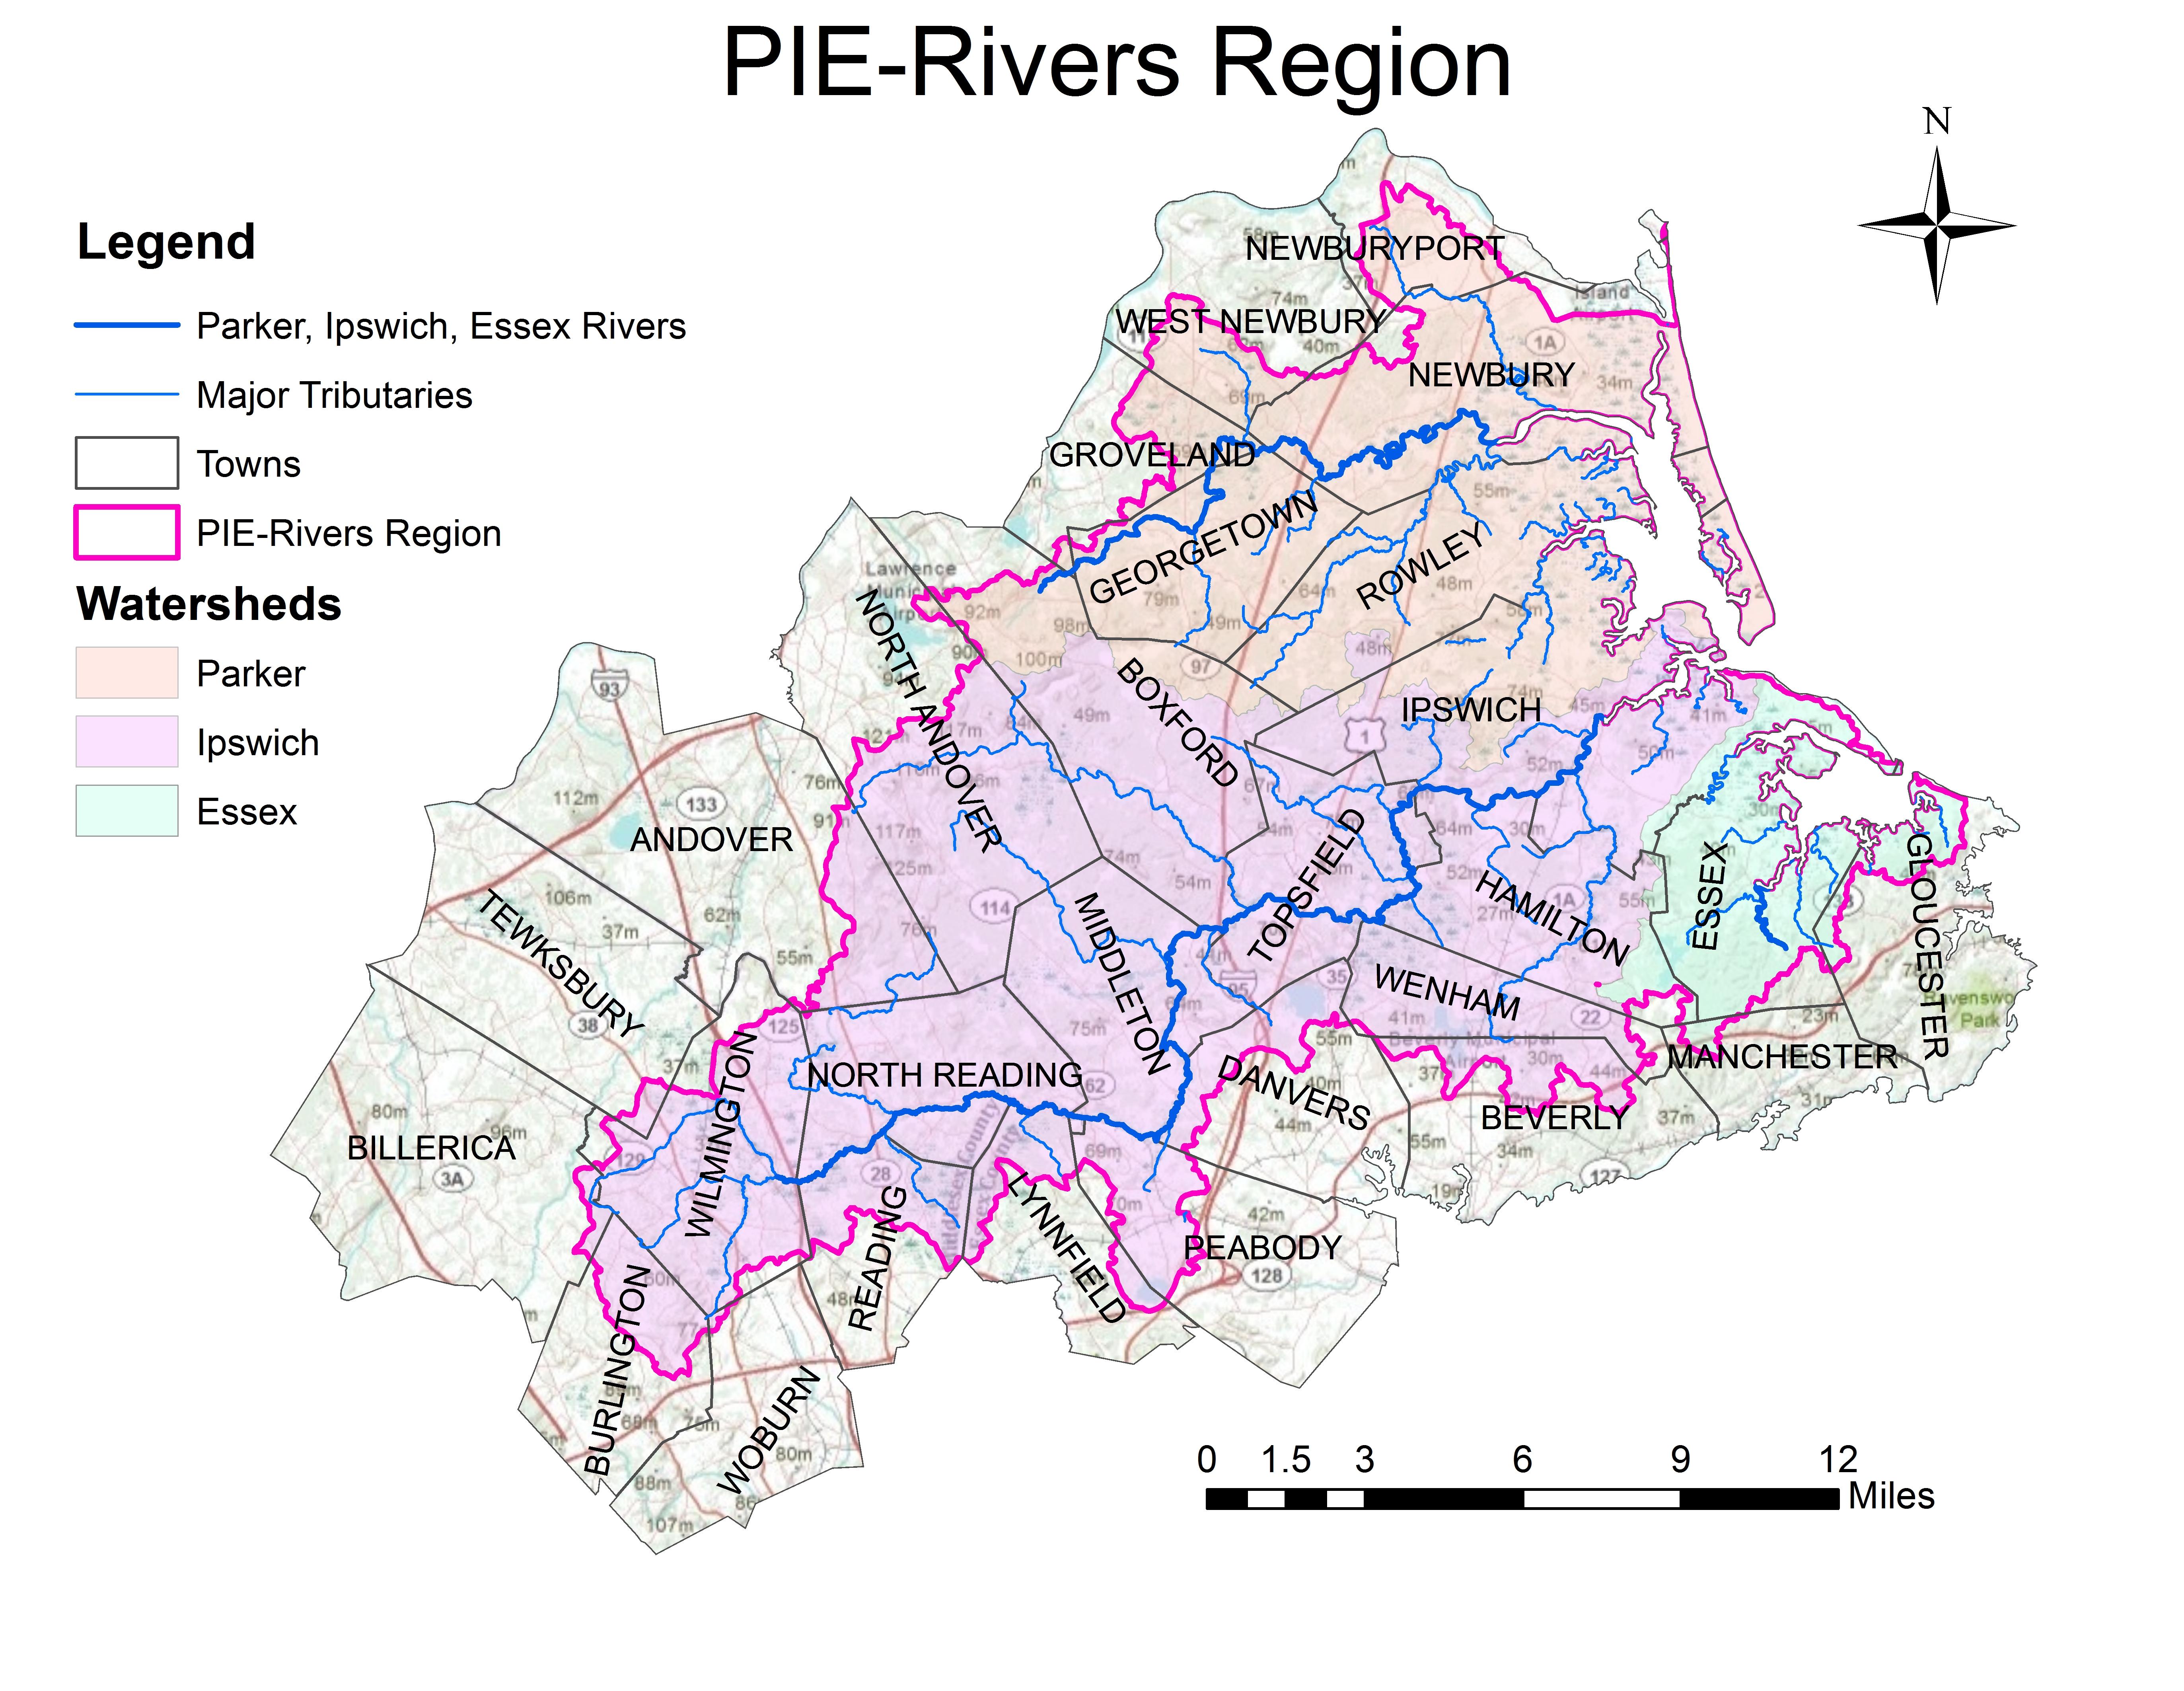 Municipal Services – The PIE-Rivers Restoration Partnership